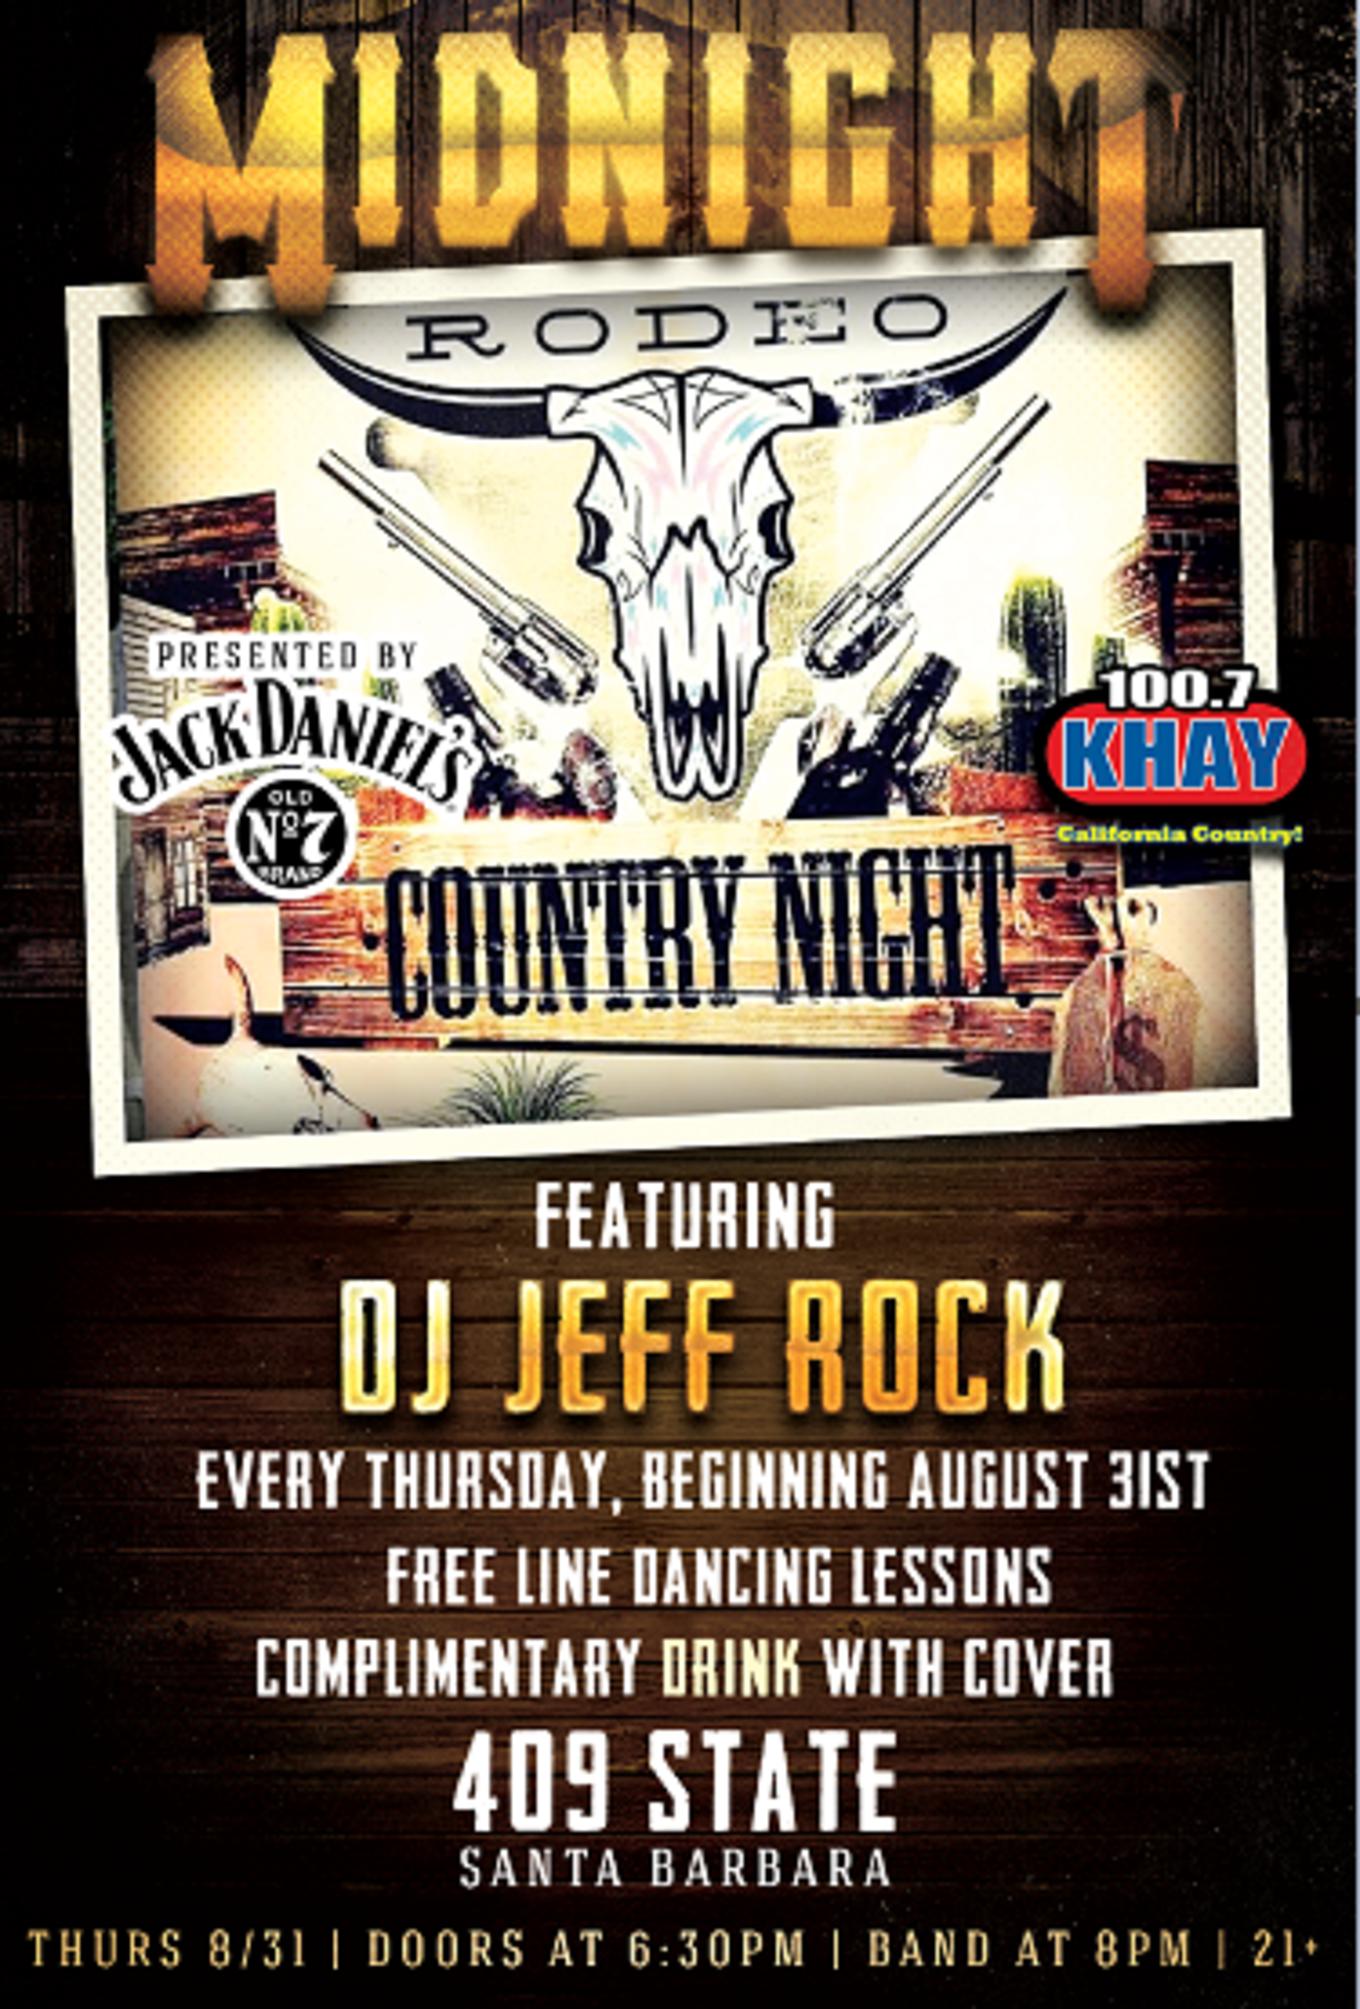 Midnight Rodeo Country Nights M8rx Nightclub Lounge